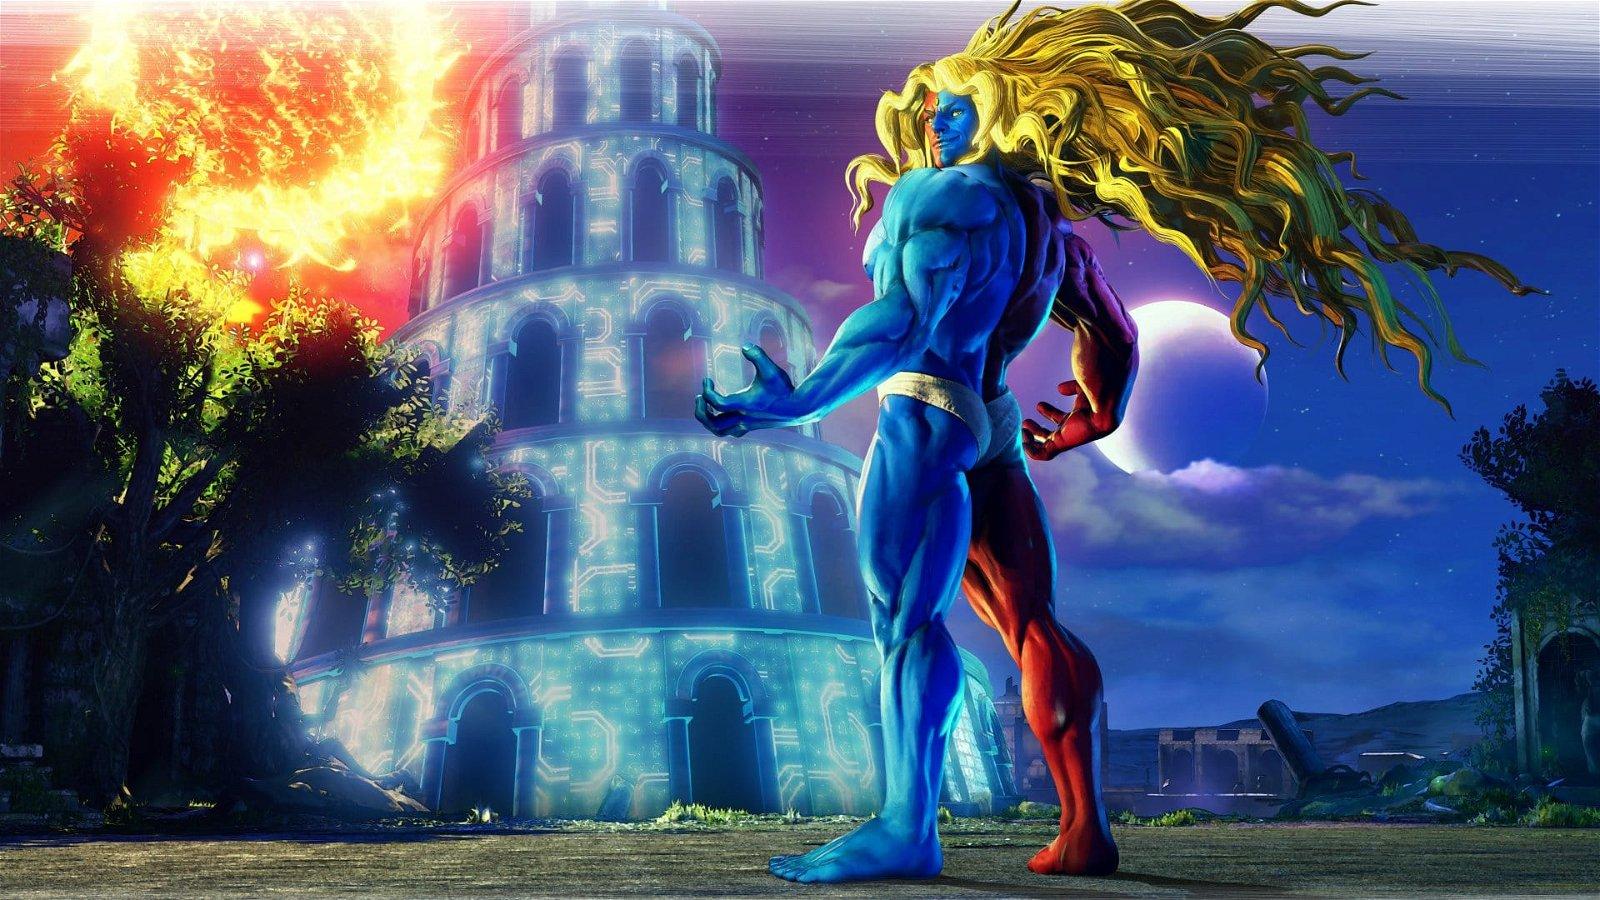 Capcom Announces Street Fighter V: Champion Edition, Coming February